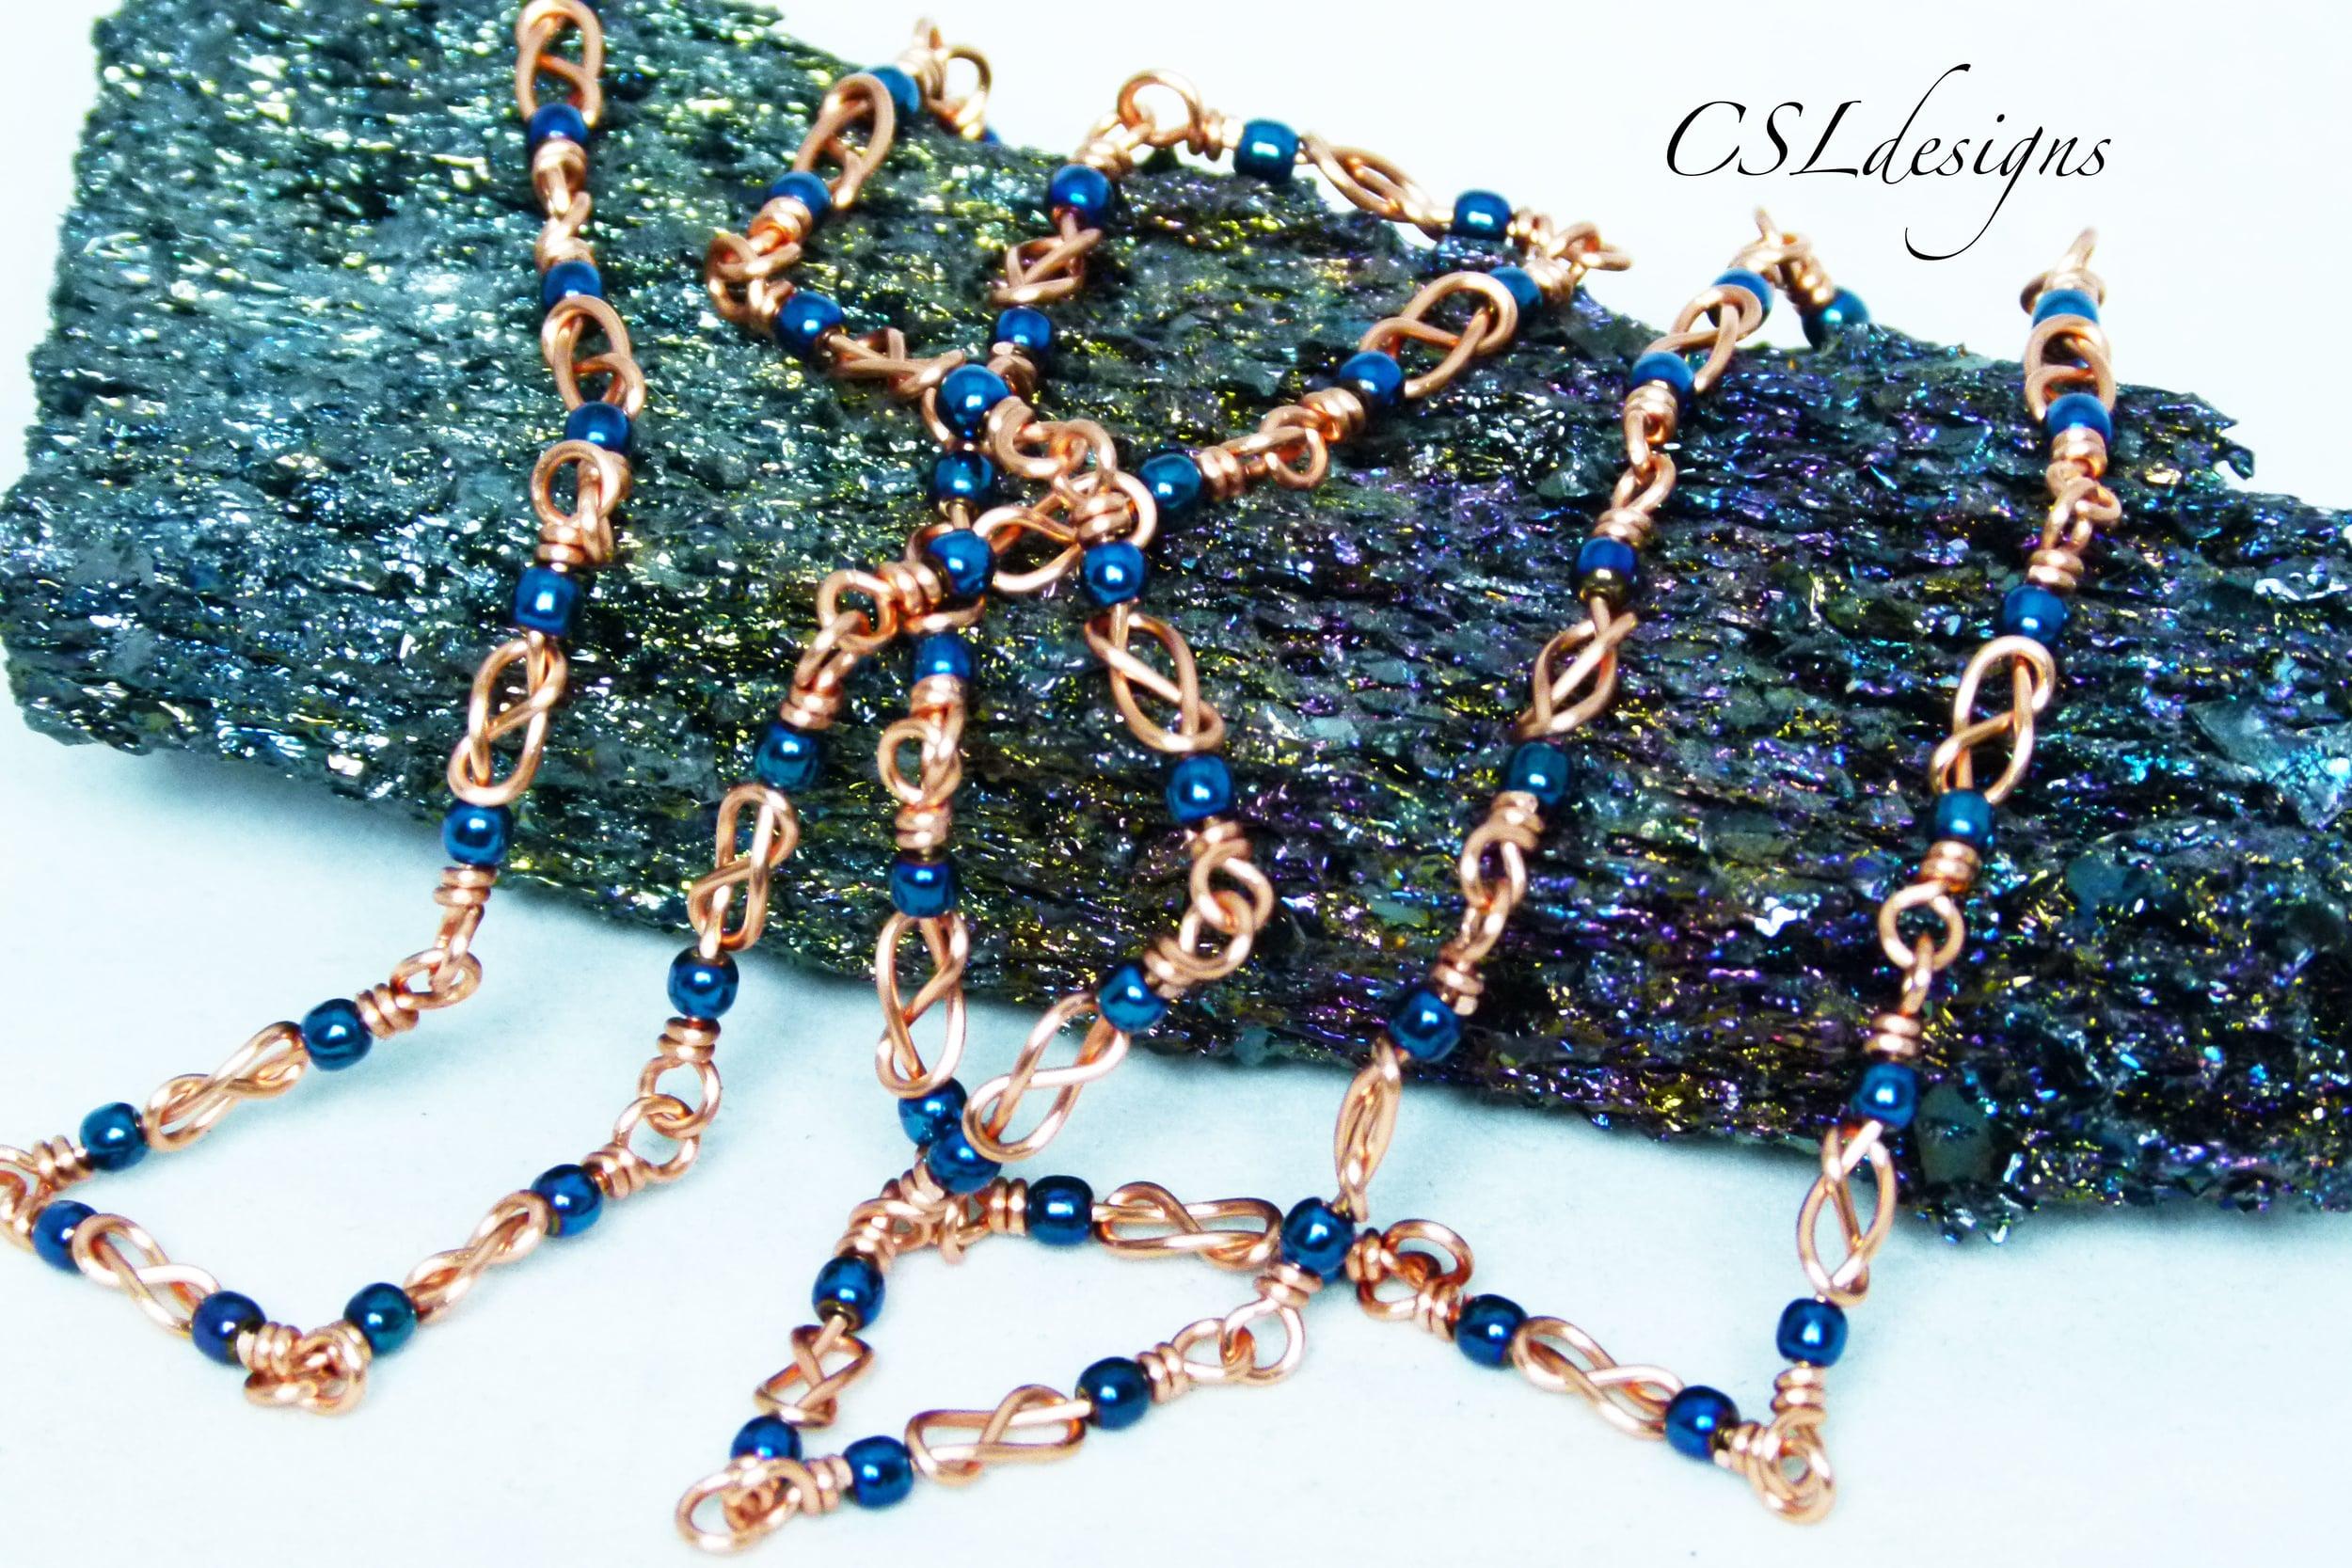 Celtic knot wirework chain thumbnail.jpg